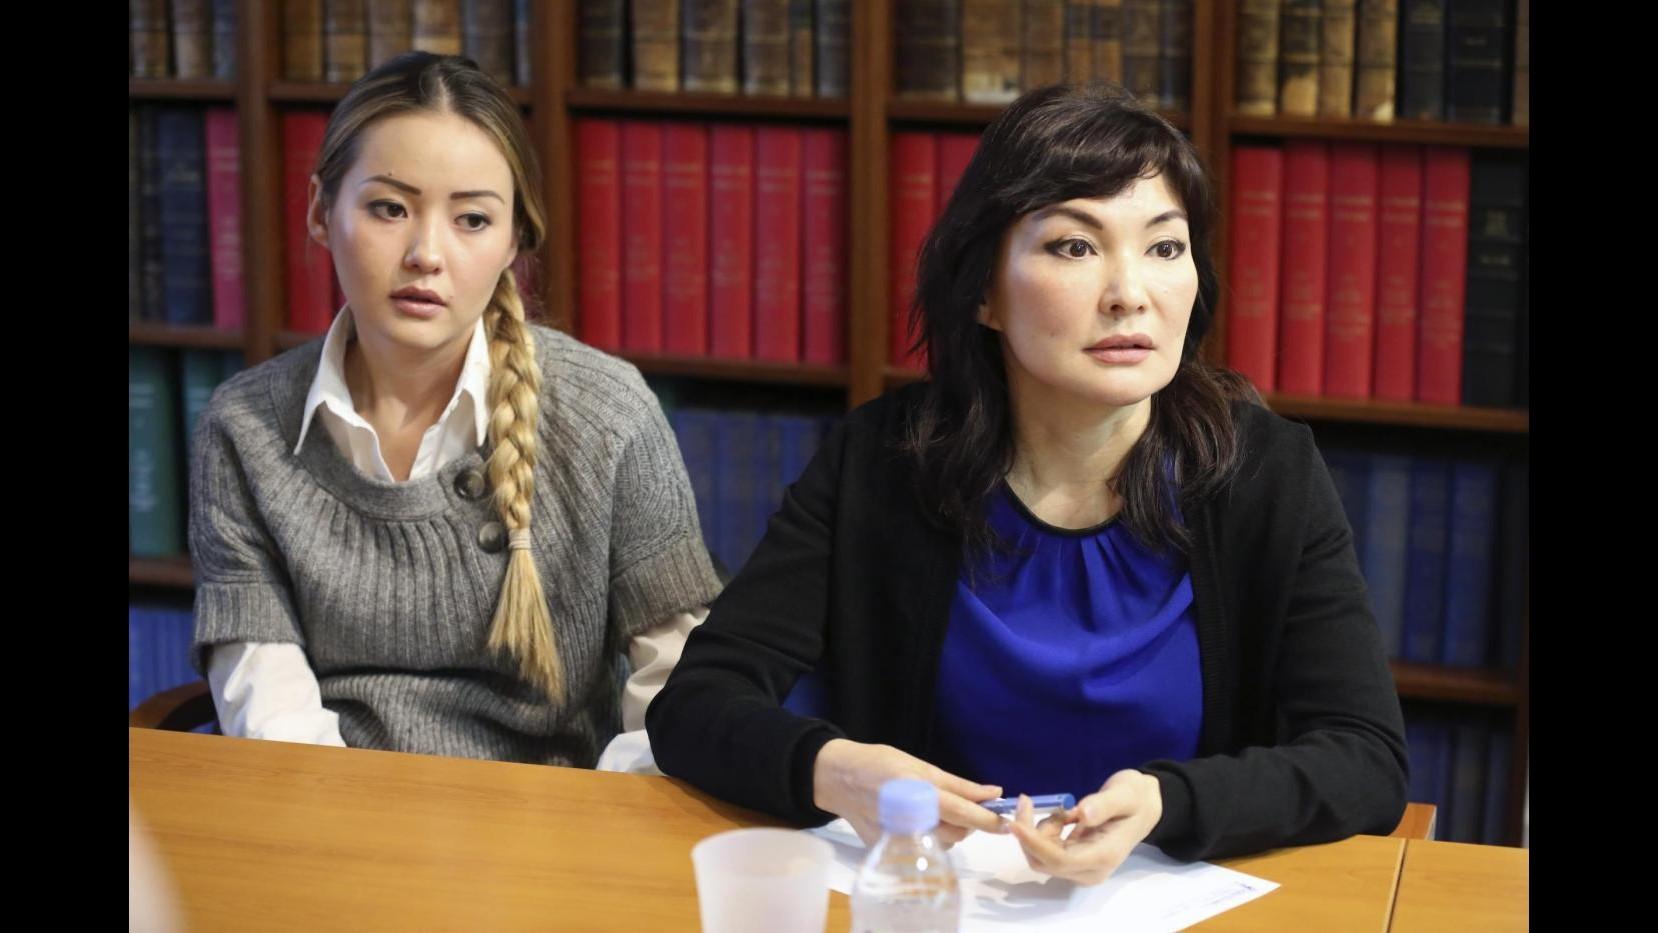 Kazakistan, Shalabayeva domani incontra giornalisti a Roma